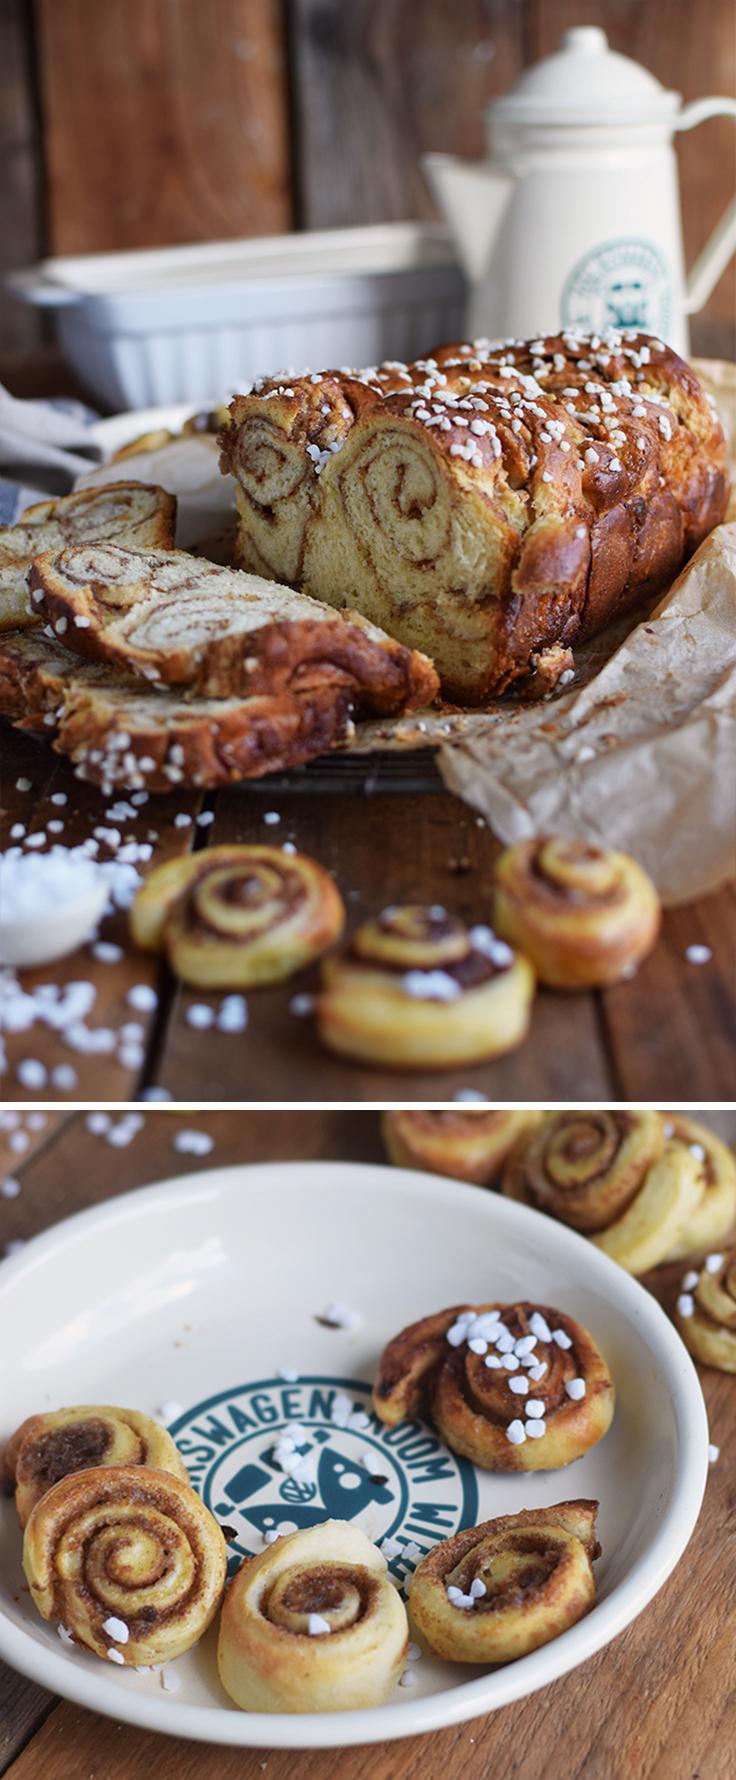 cinnamon-roll-bread-zimtschnecken-brot